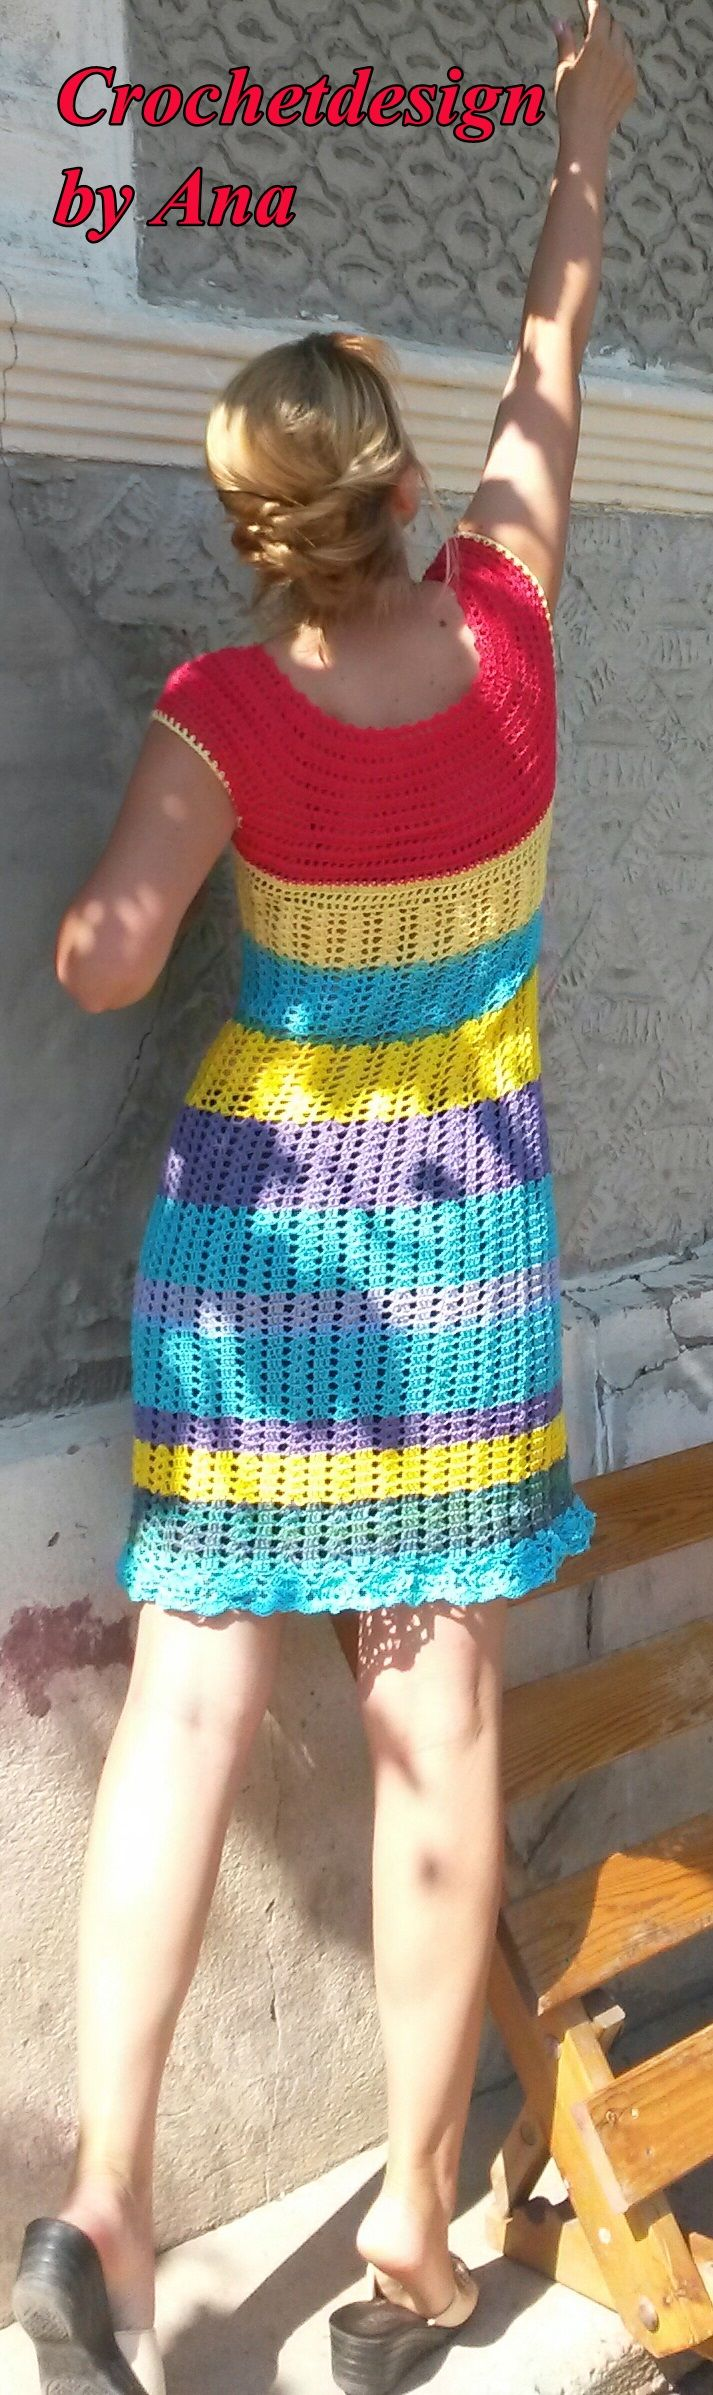 Crochet summer colorful dress